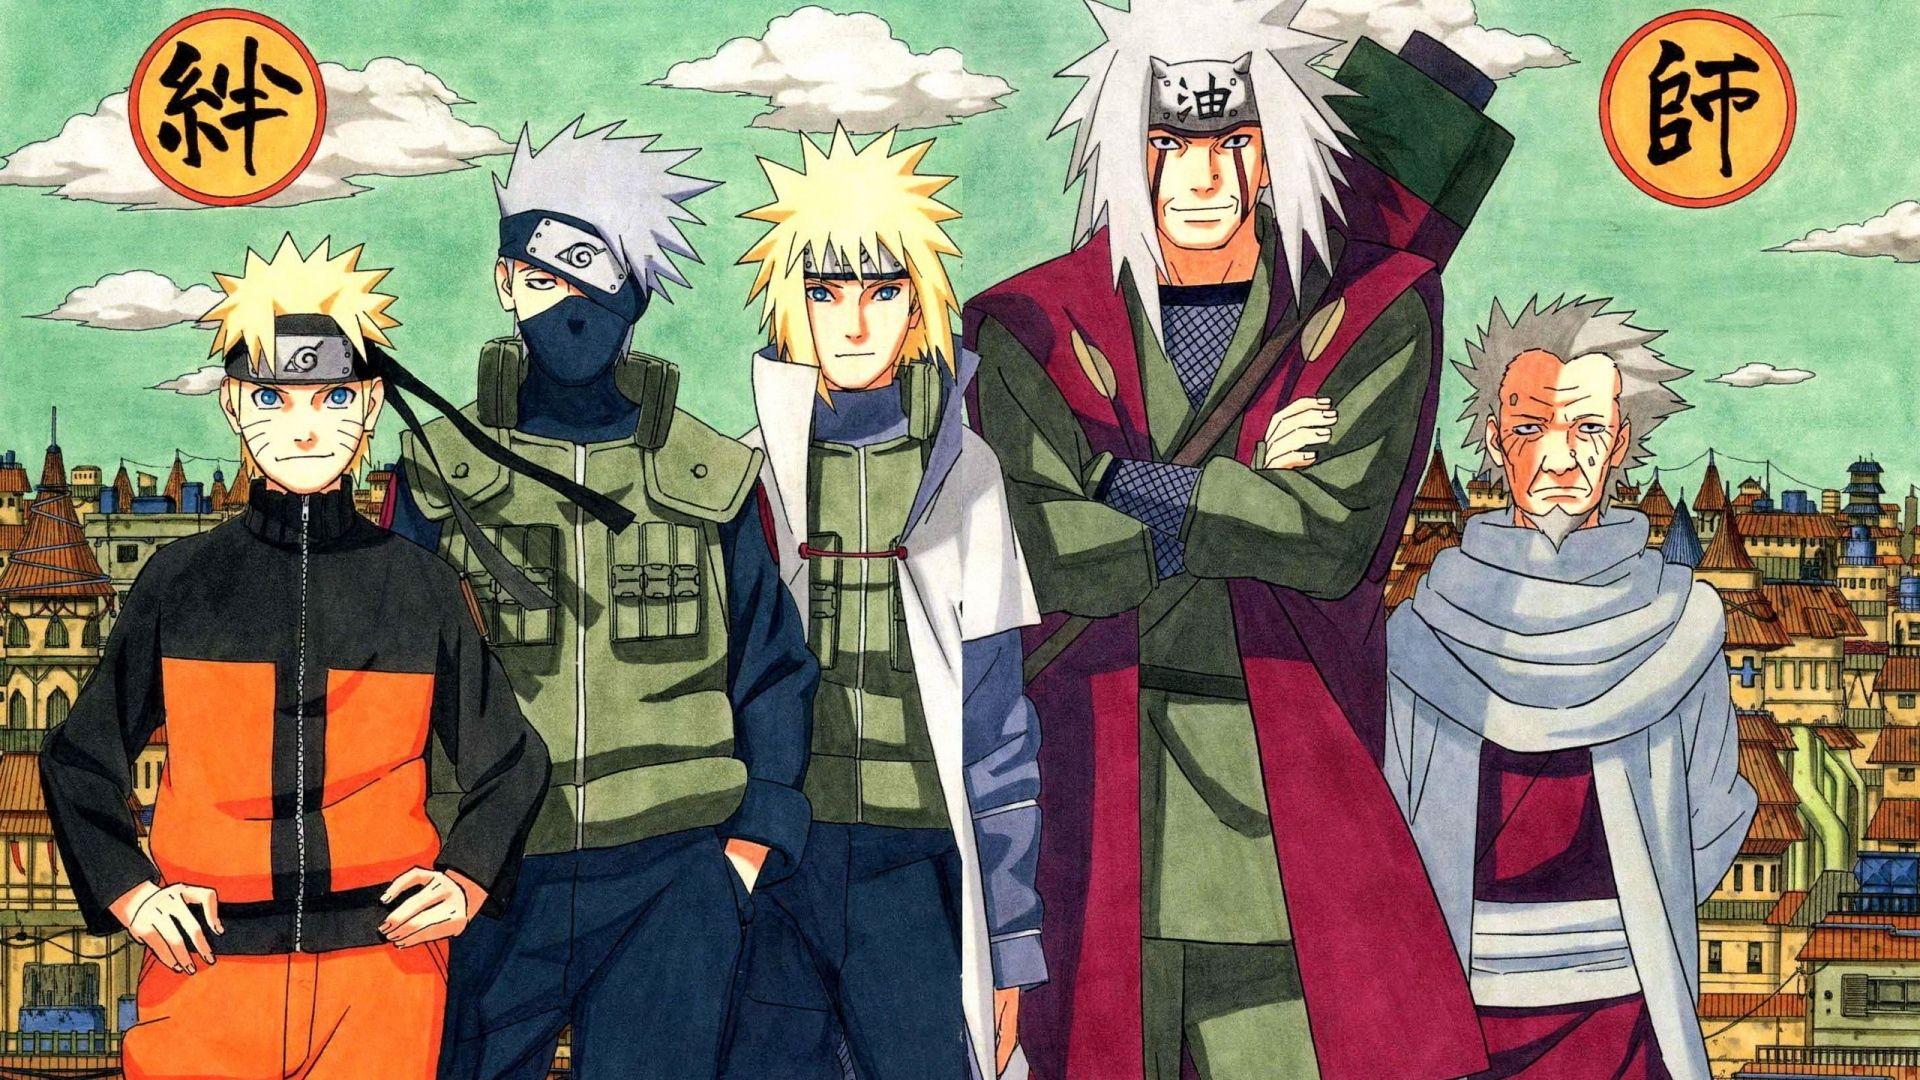 Download Free Naruto Wallpaper Full Hd Naruto Wallpaper Naruto